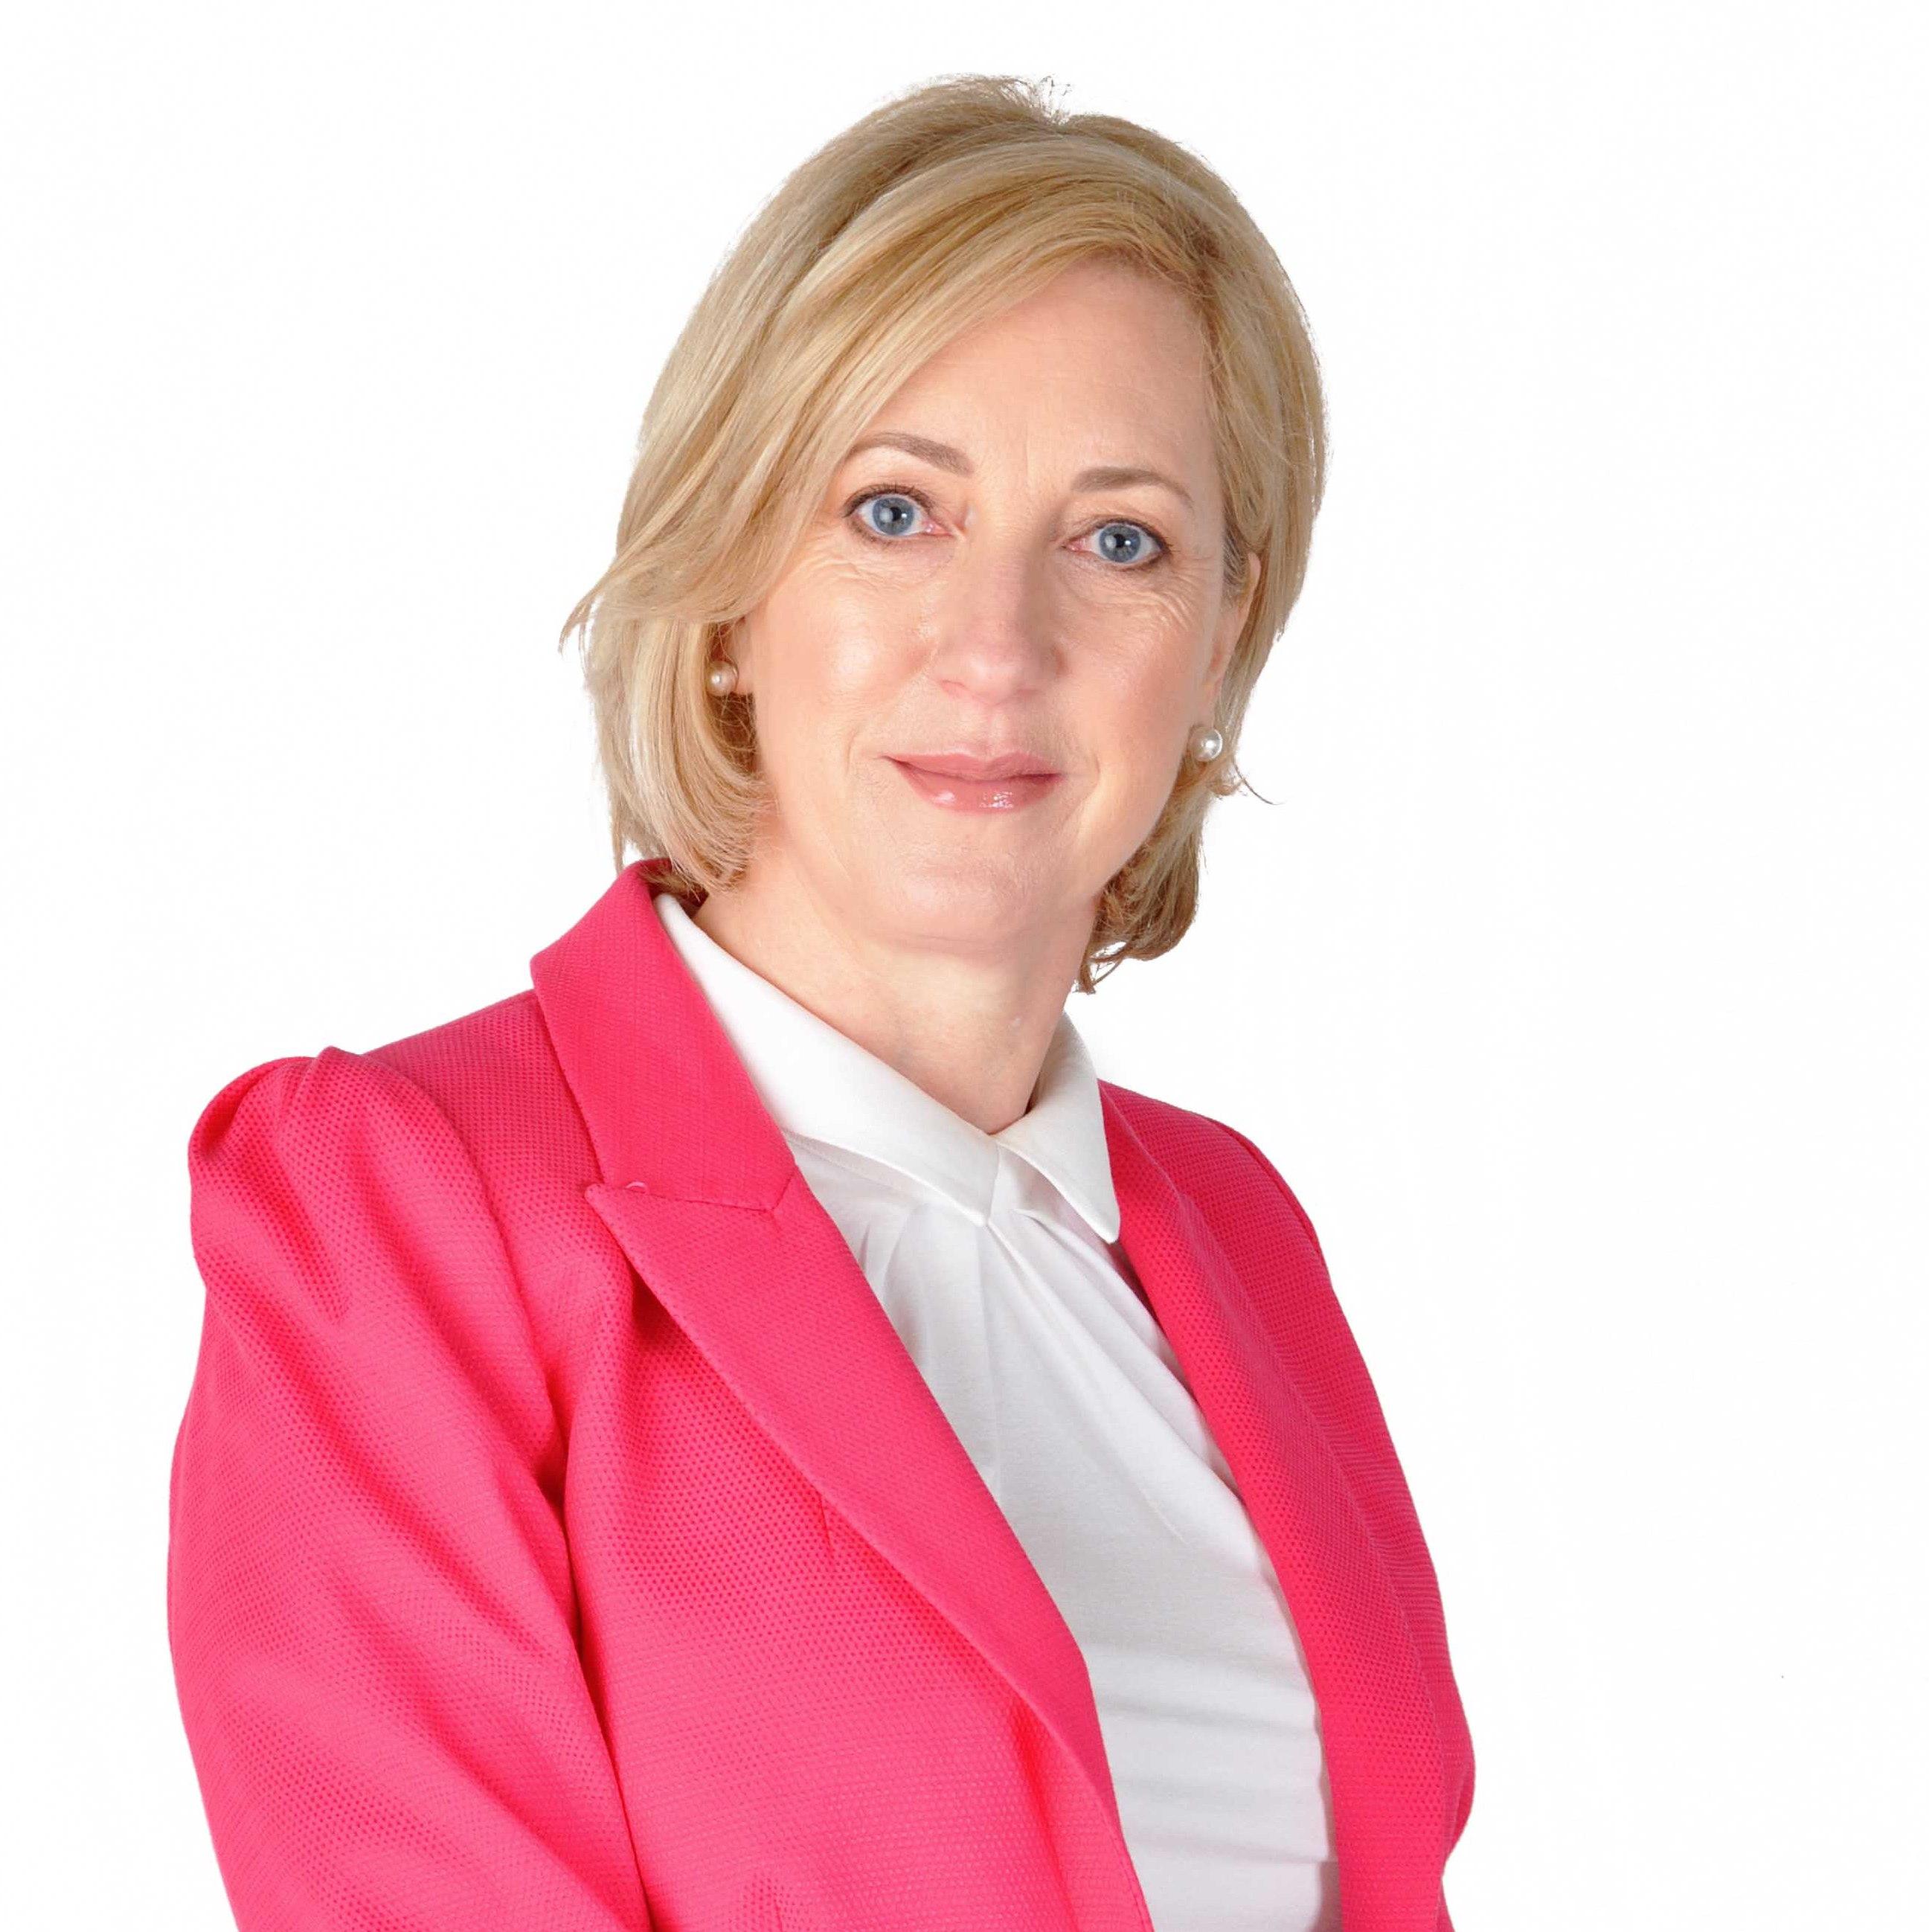 Deborah Hadley